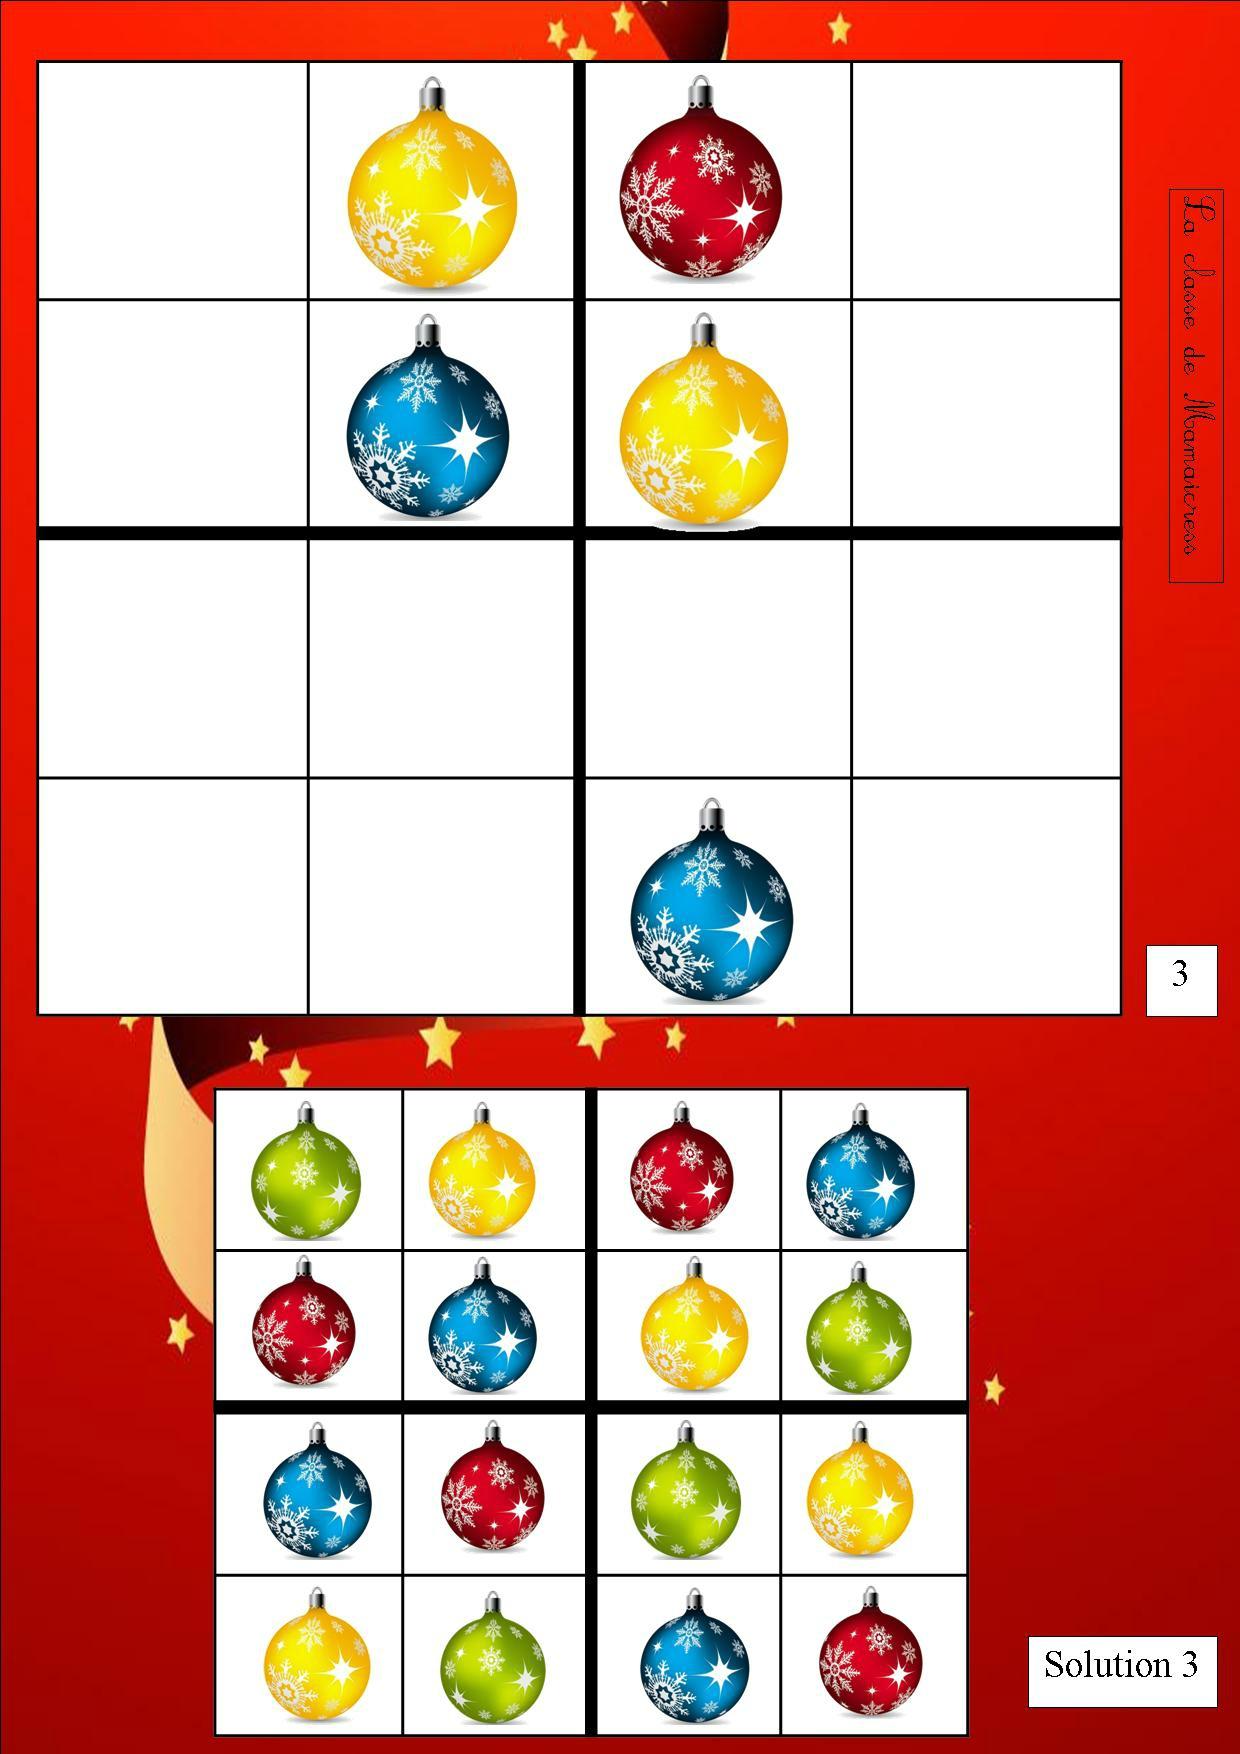 Sudoku De Noël - La Classe De Mamaicress avec Sudoku Maternelle À Imprimer